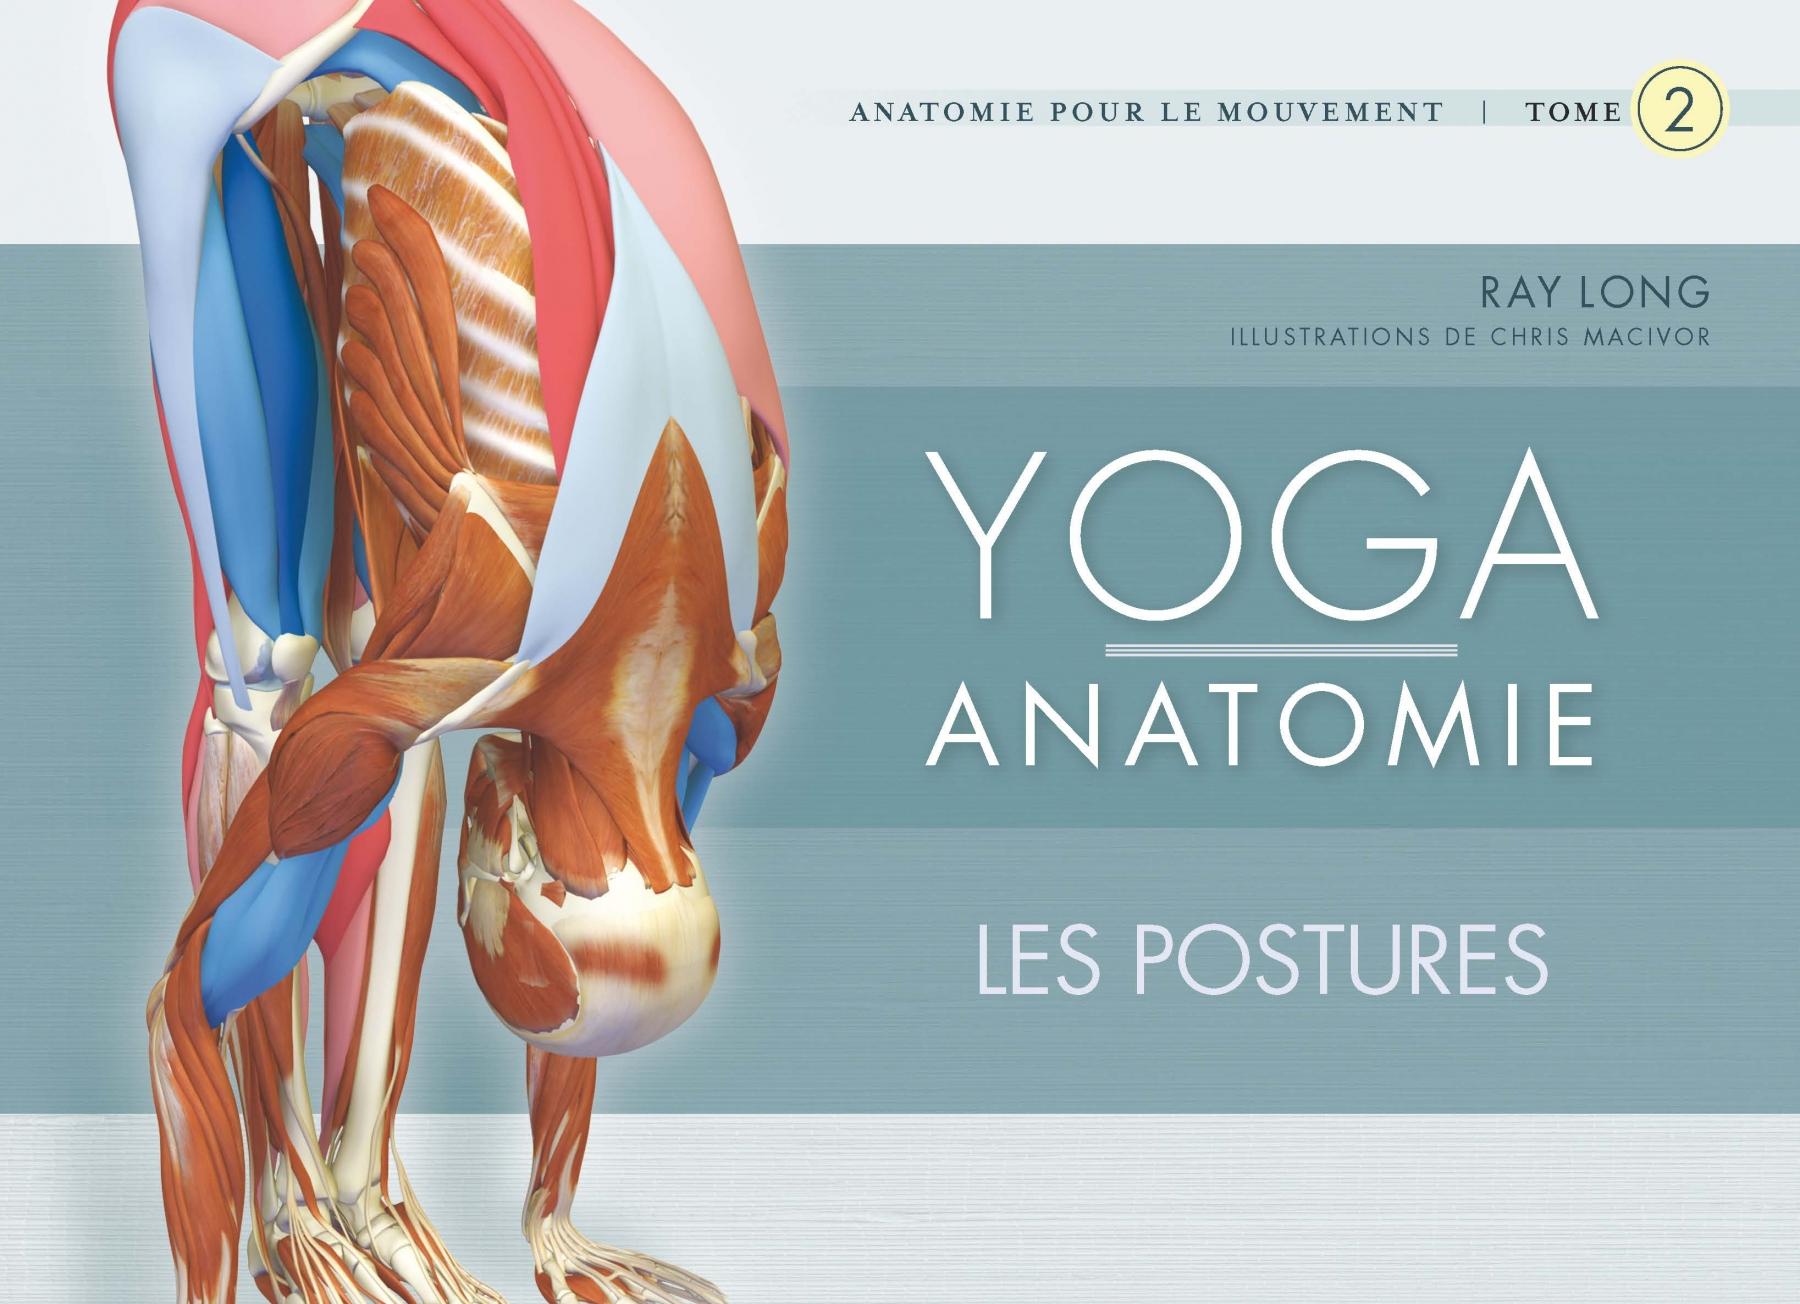 LIVRE - Yoga anatomie tome 2 - les postures